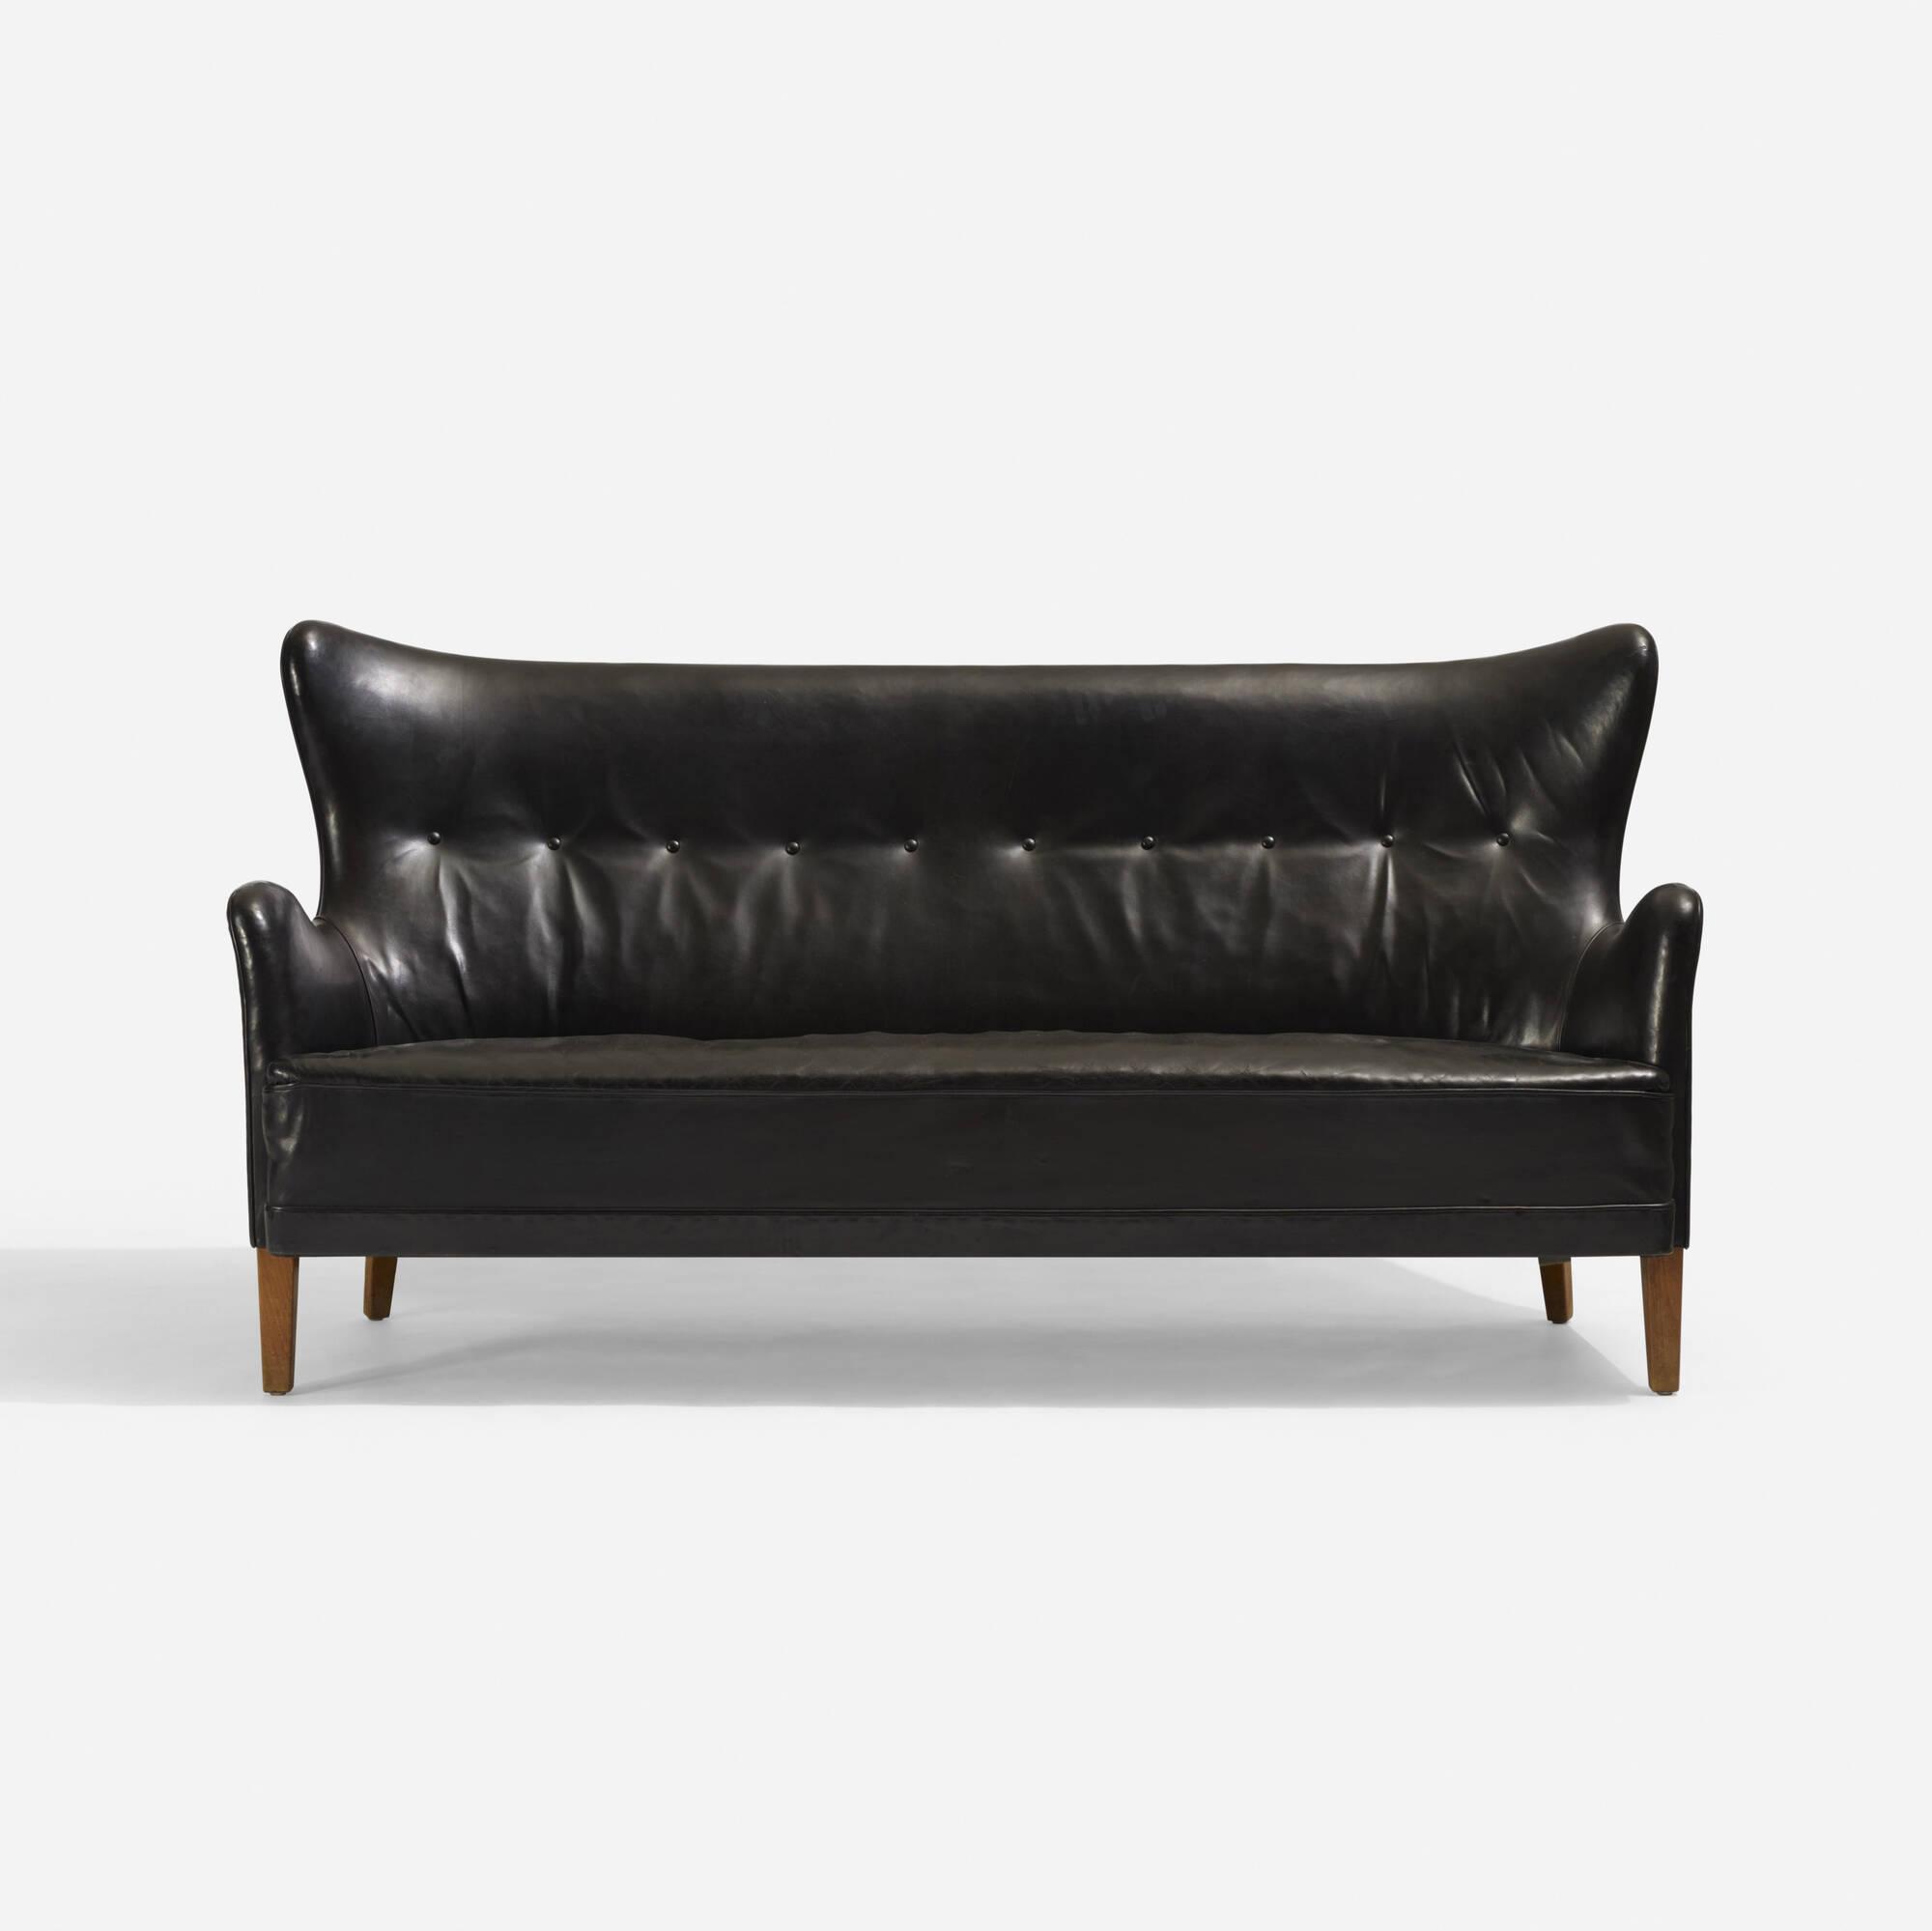 234: Frits Henningsen / sofa (2 of 3)